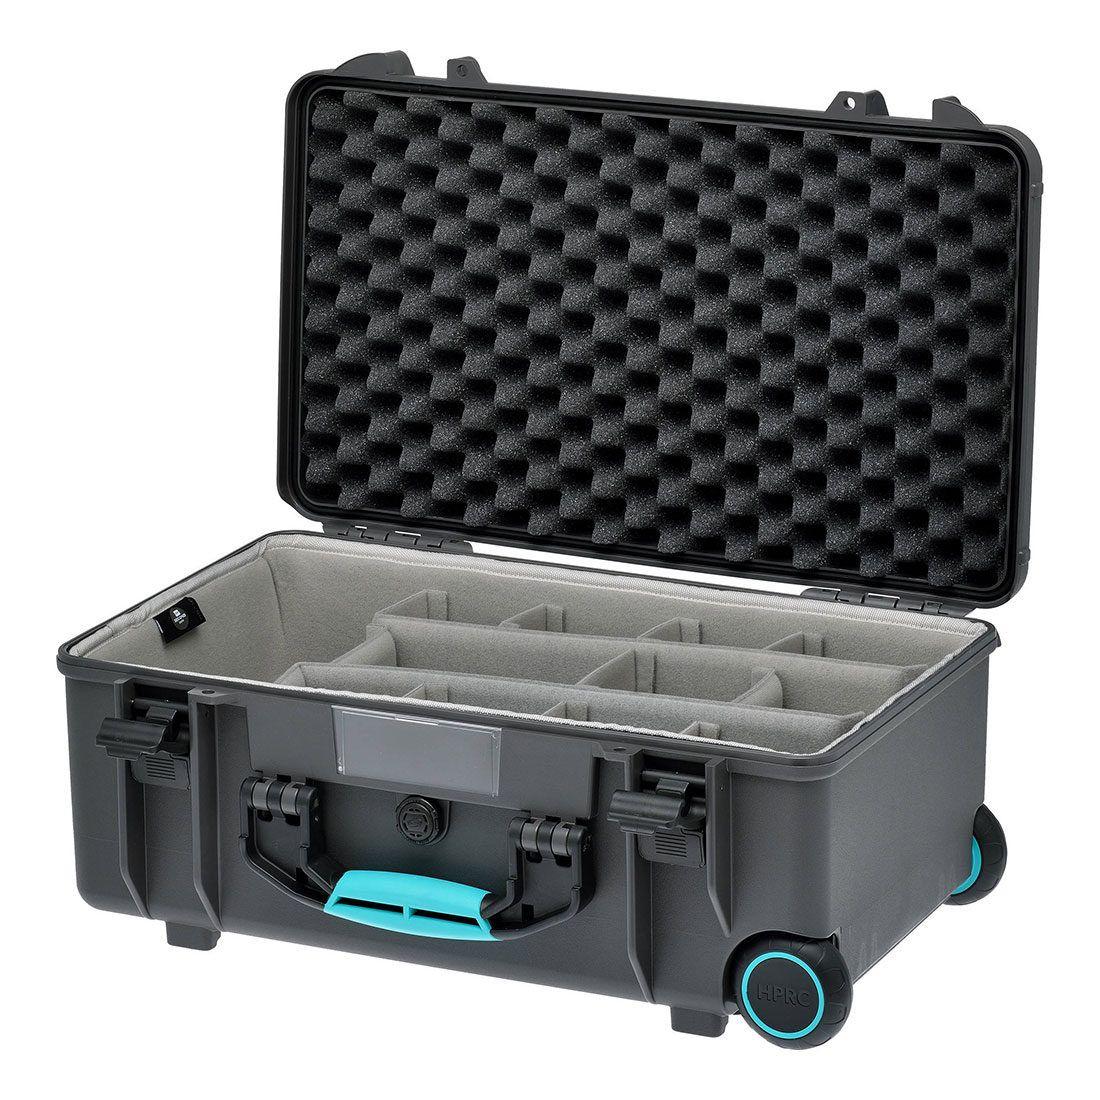 HPRC 2550W Kamera Equipment Trolley